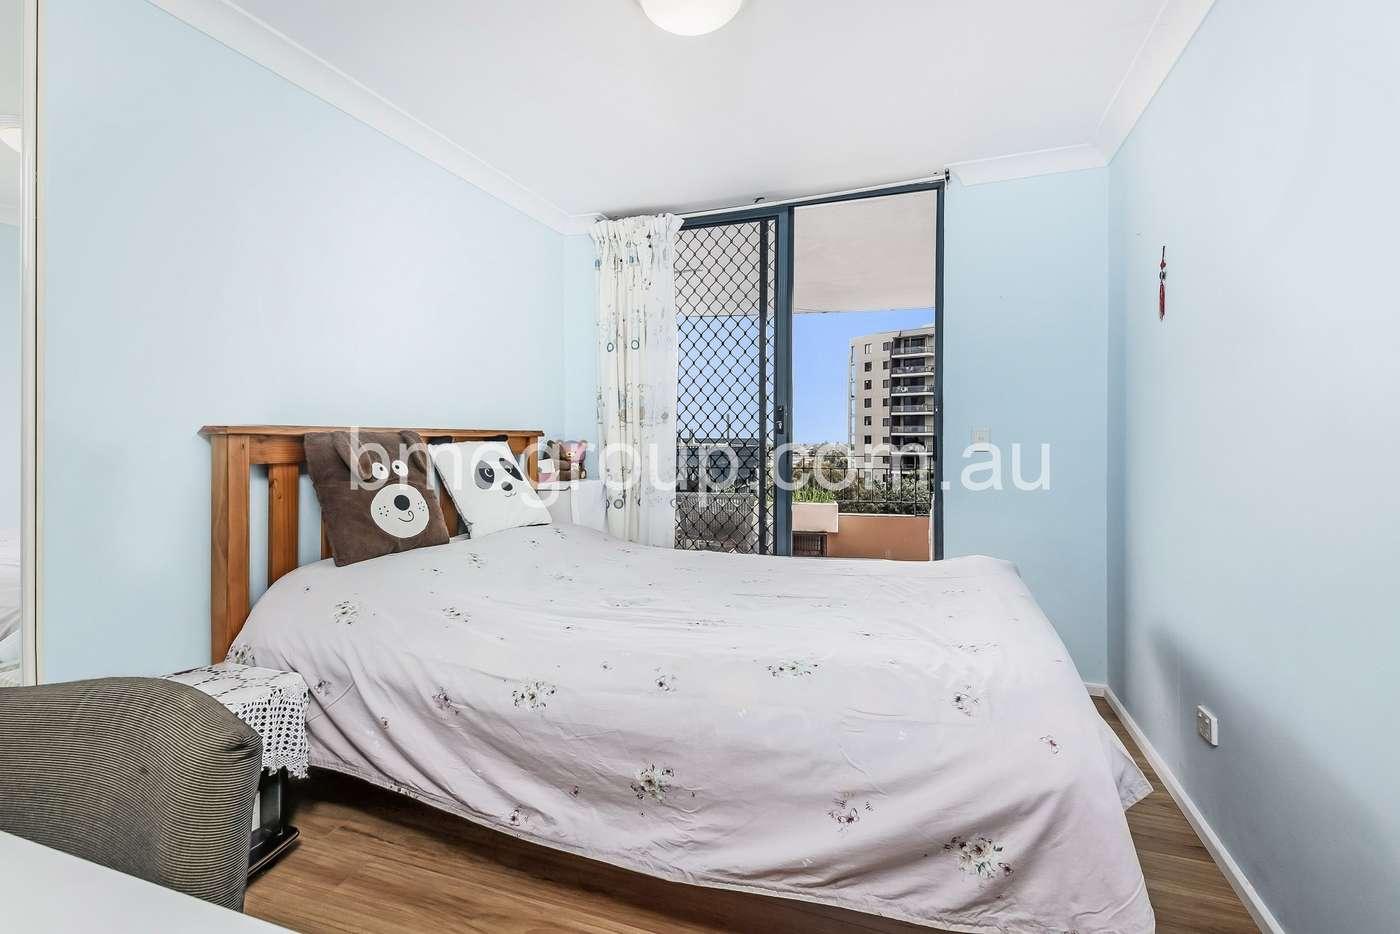 Sixth view of Homely apartment listing, Unit 41/2-8 Bridge St, Hurstville NSW 2220